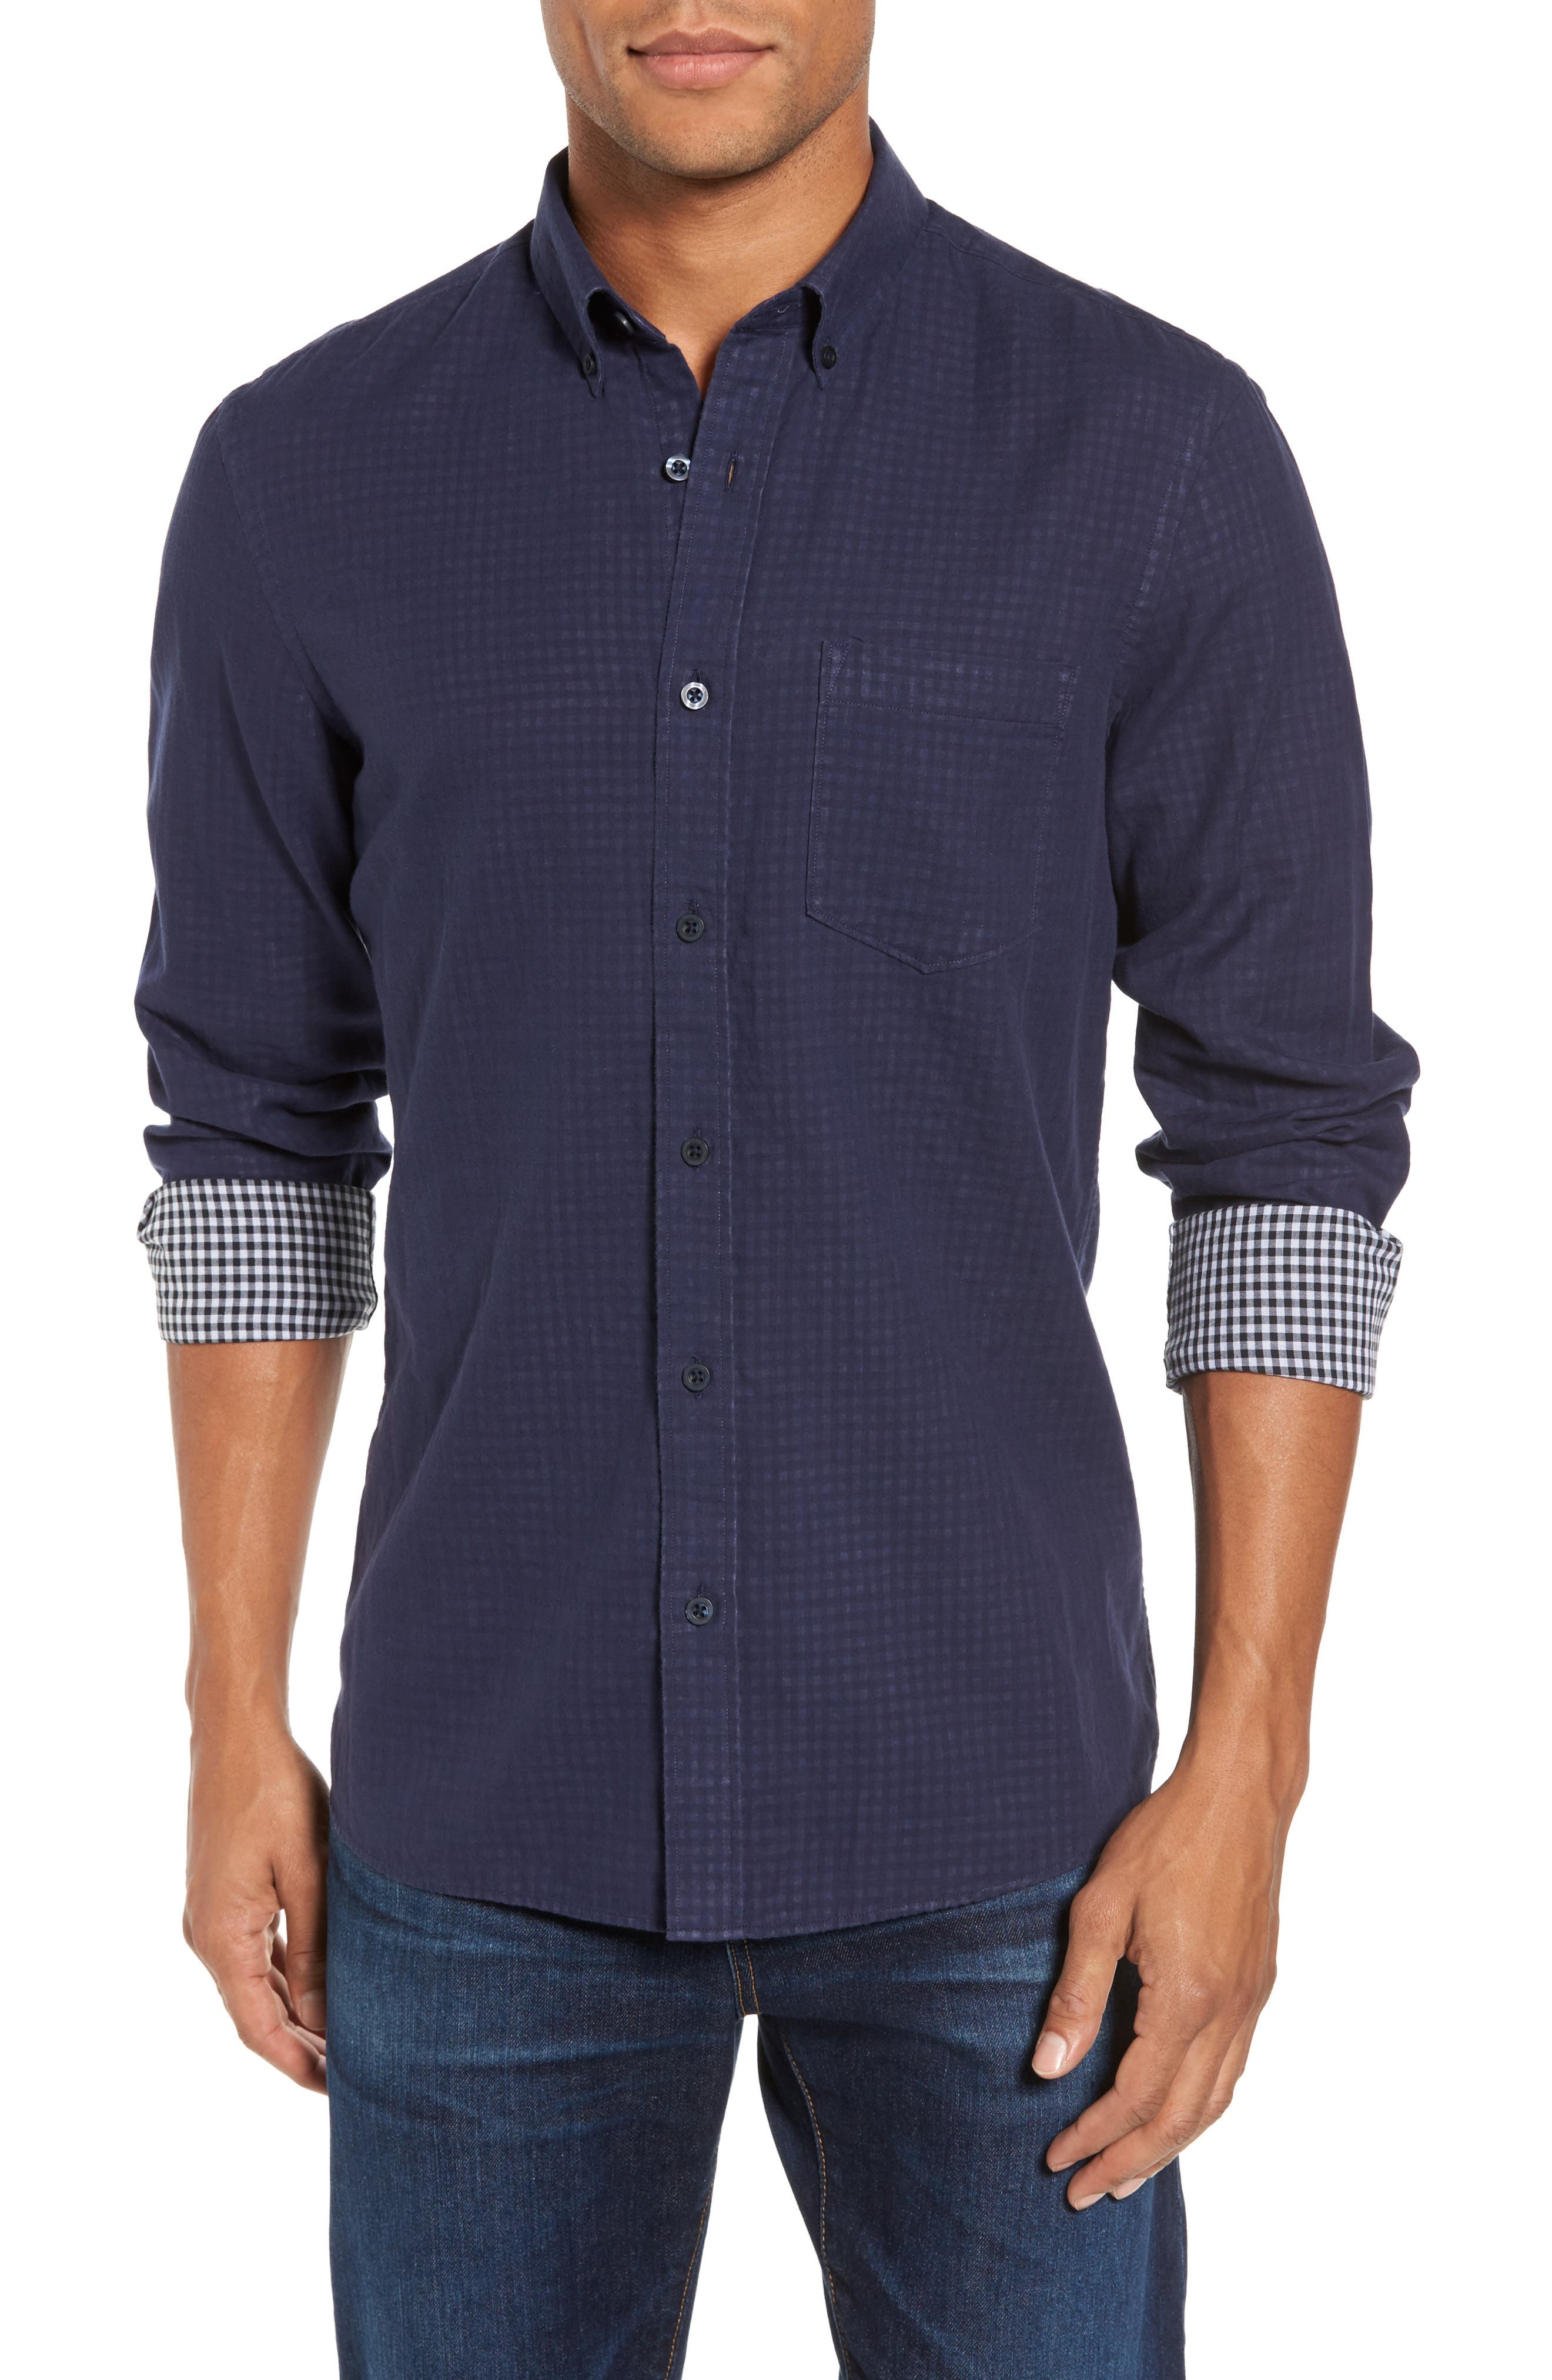 Trim Fit Duofold Sport Shirt,                         Main,                         color, Navy Iris Gingham Duofold